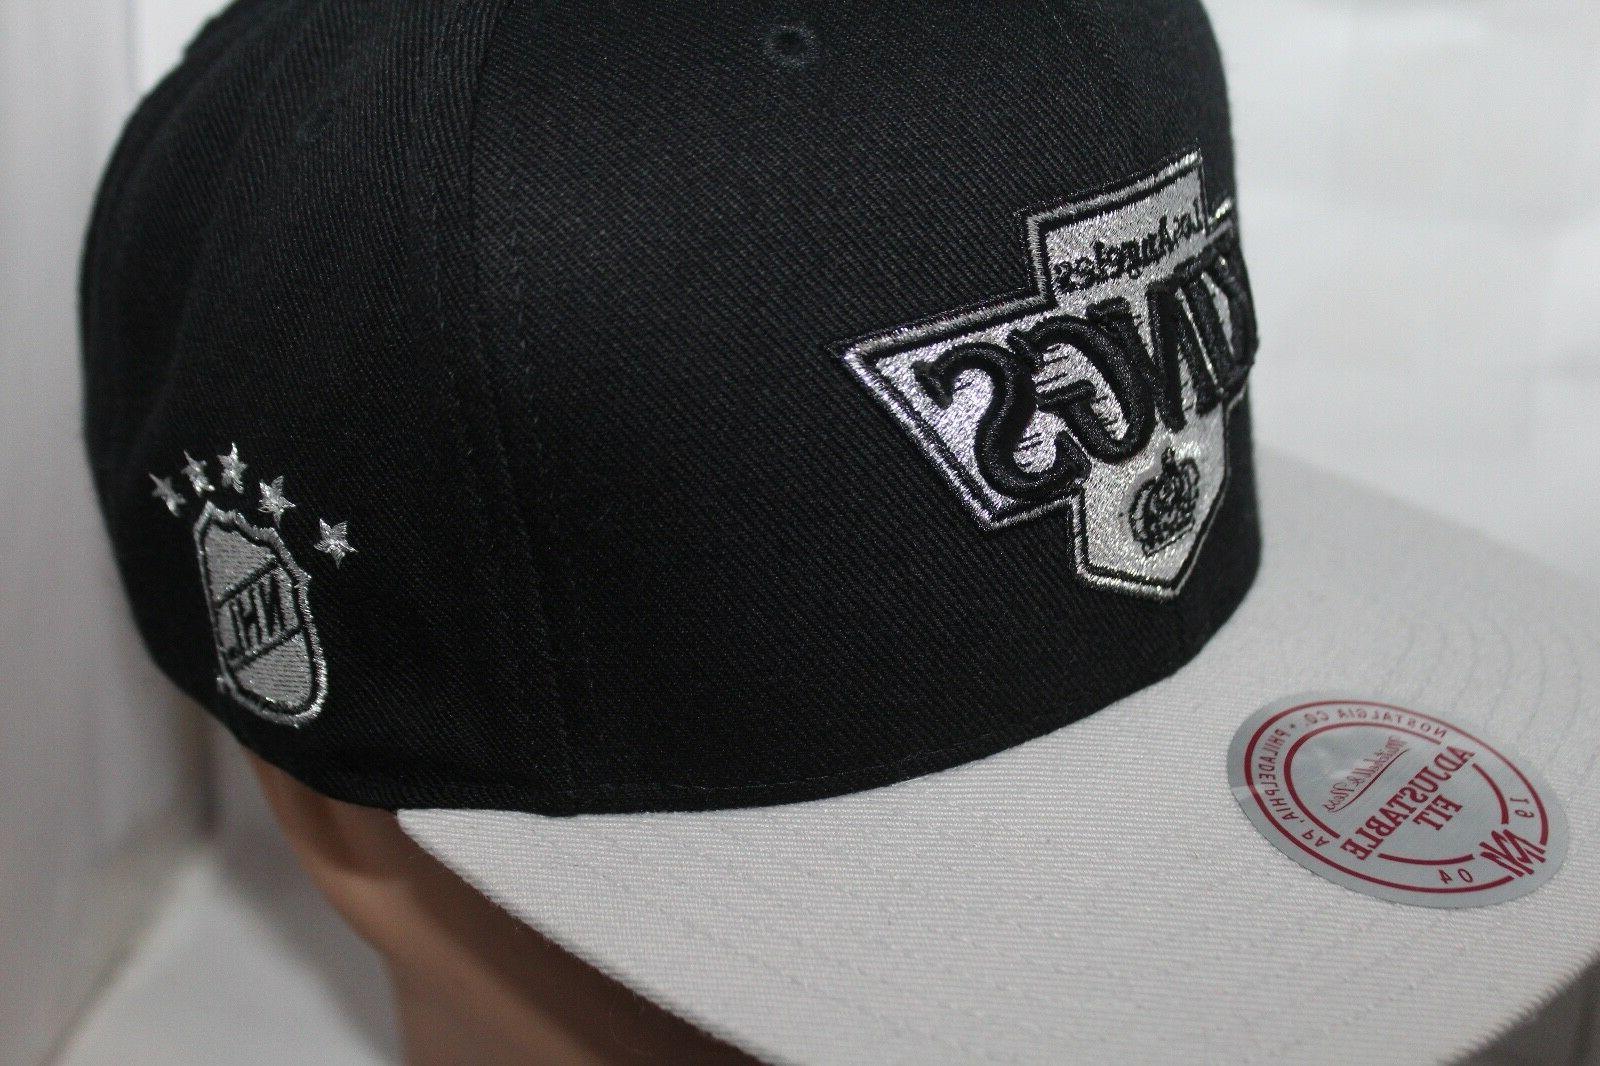 Los Angeles & Tone SnapBack,Hat,cap $ 31.99 NEW